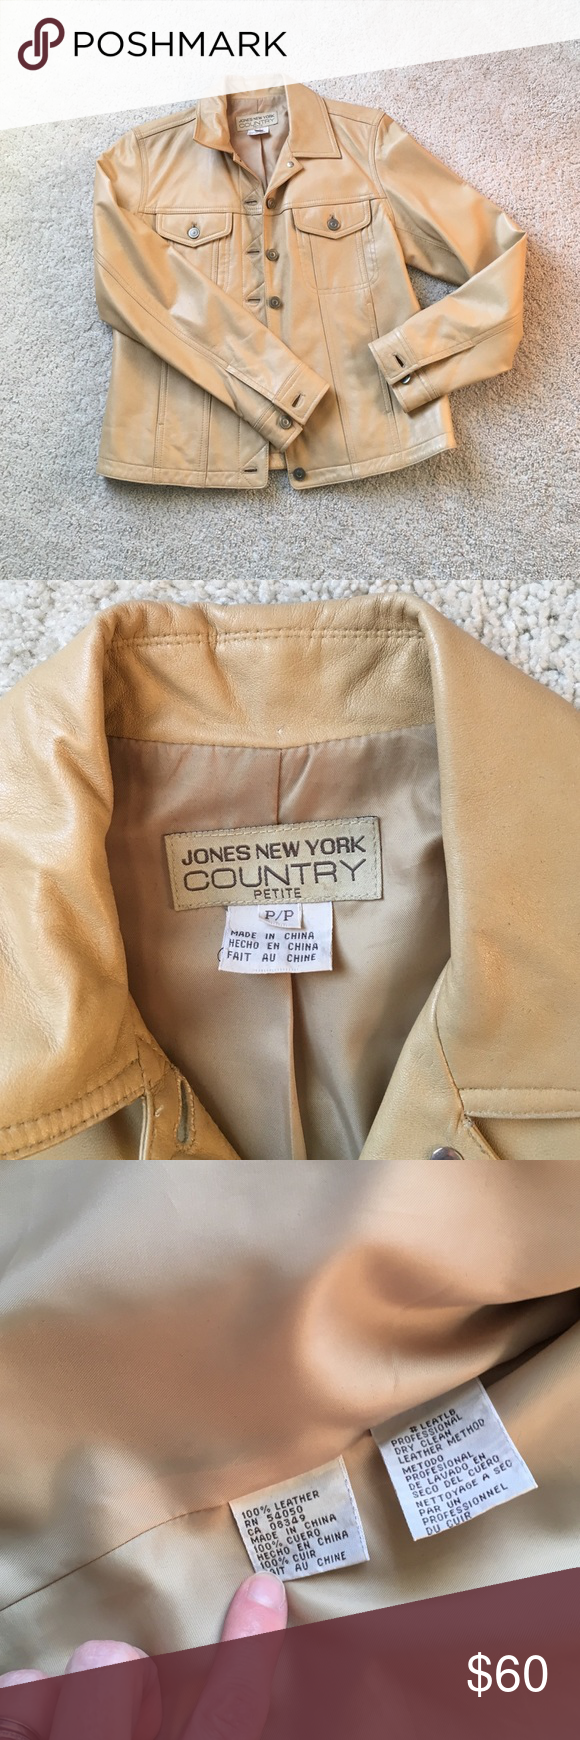 Camel Colored Leather Jacket- XS Jones New York Leather Jacket Jones New York Jackets & Coats Utility Jackets